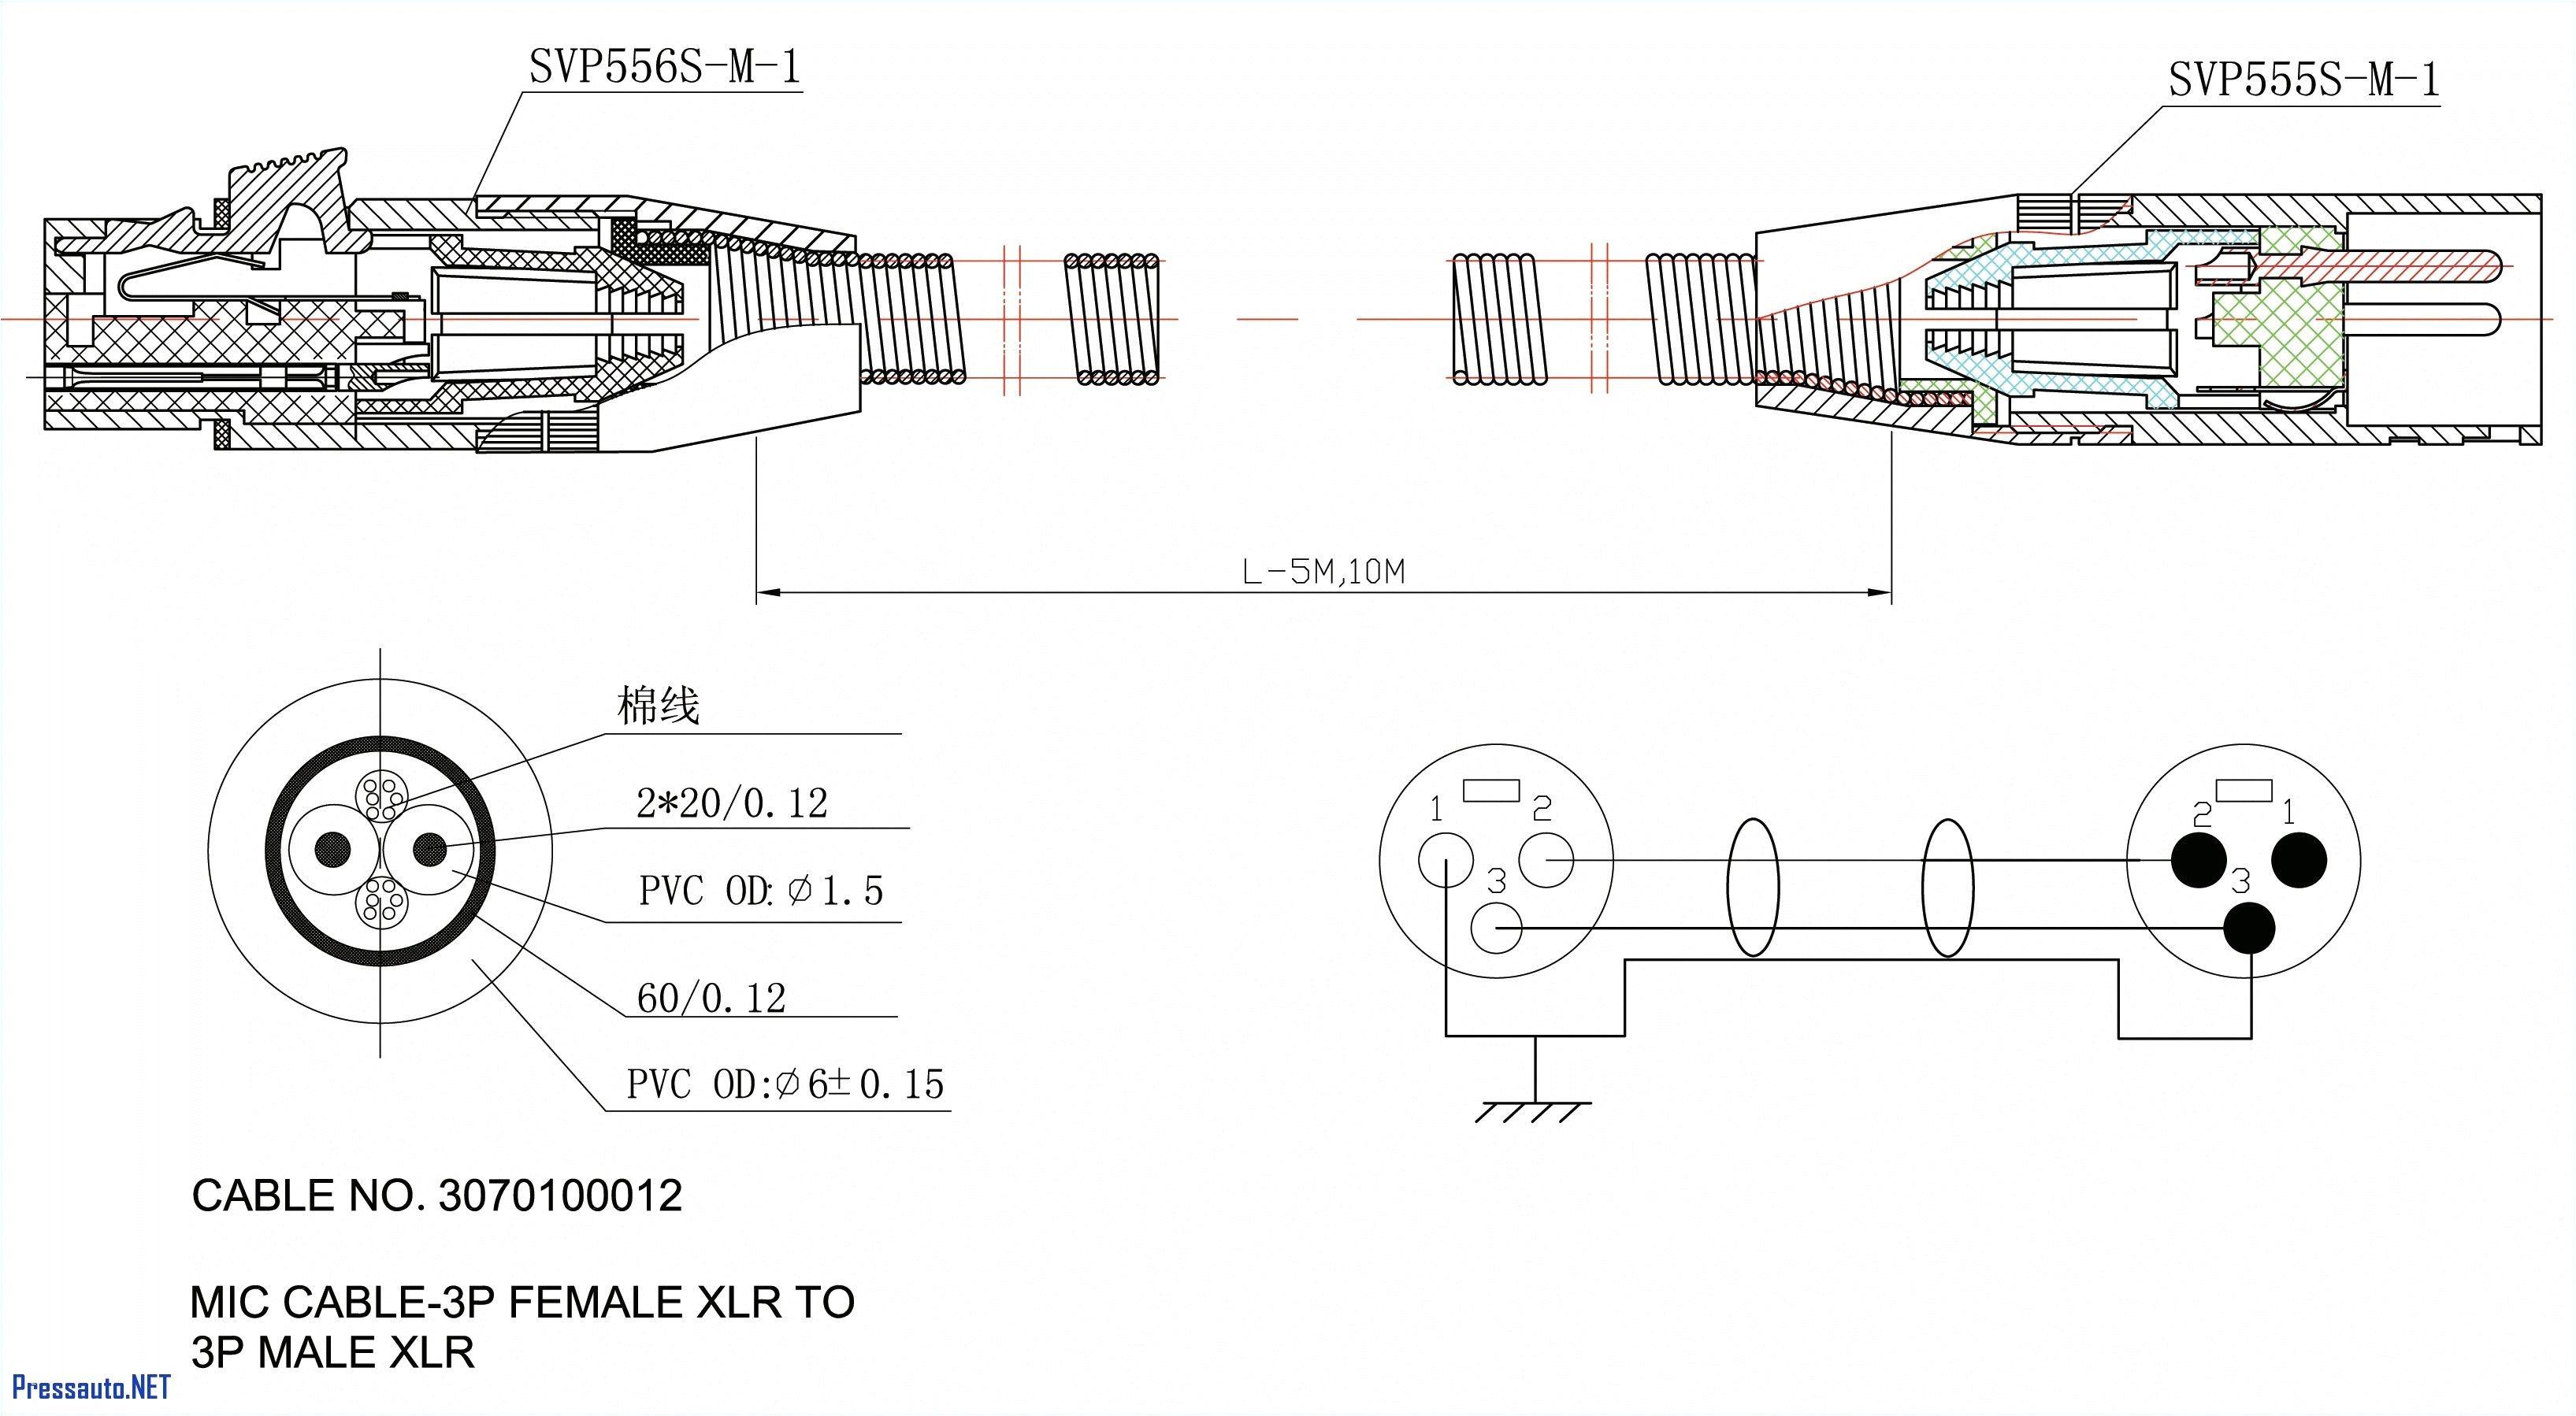 orthman wiring diagram blog wiring diagram orthman wiring diagram